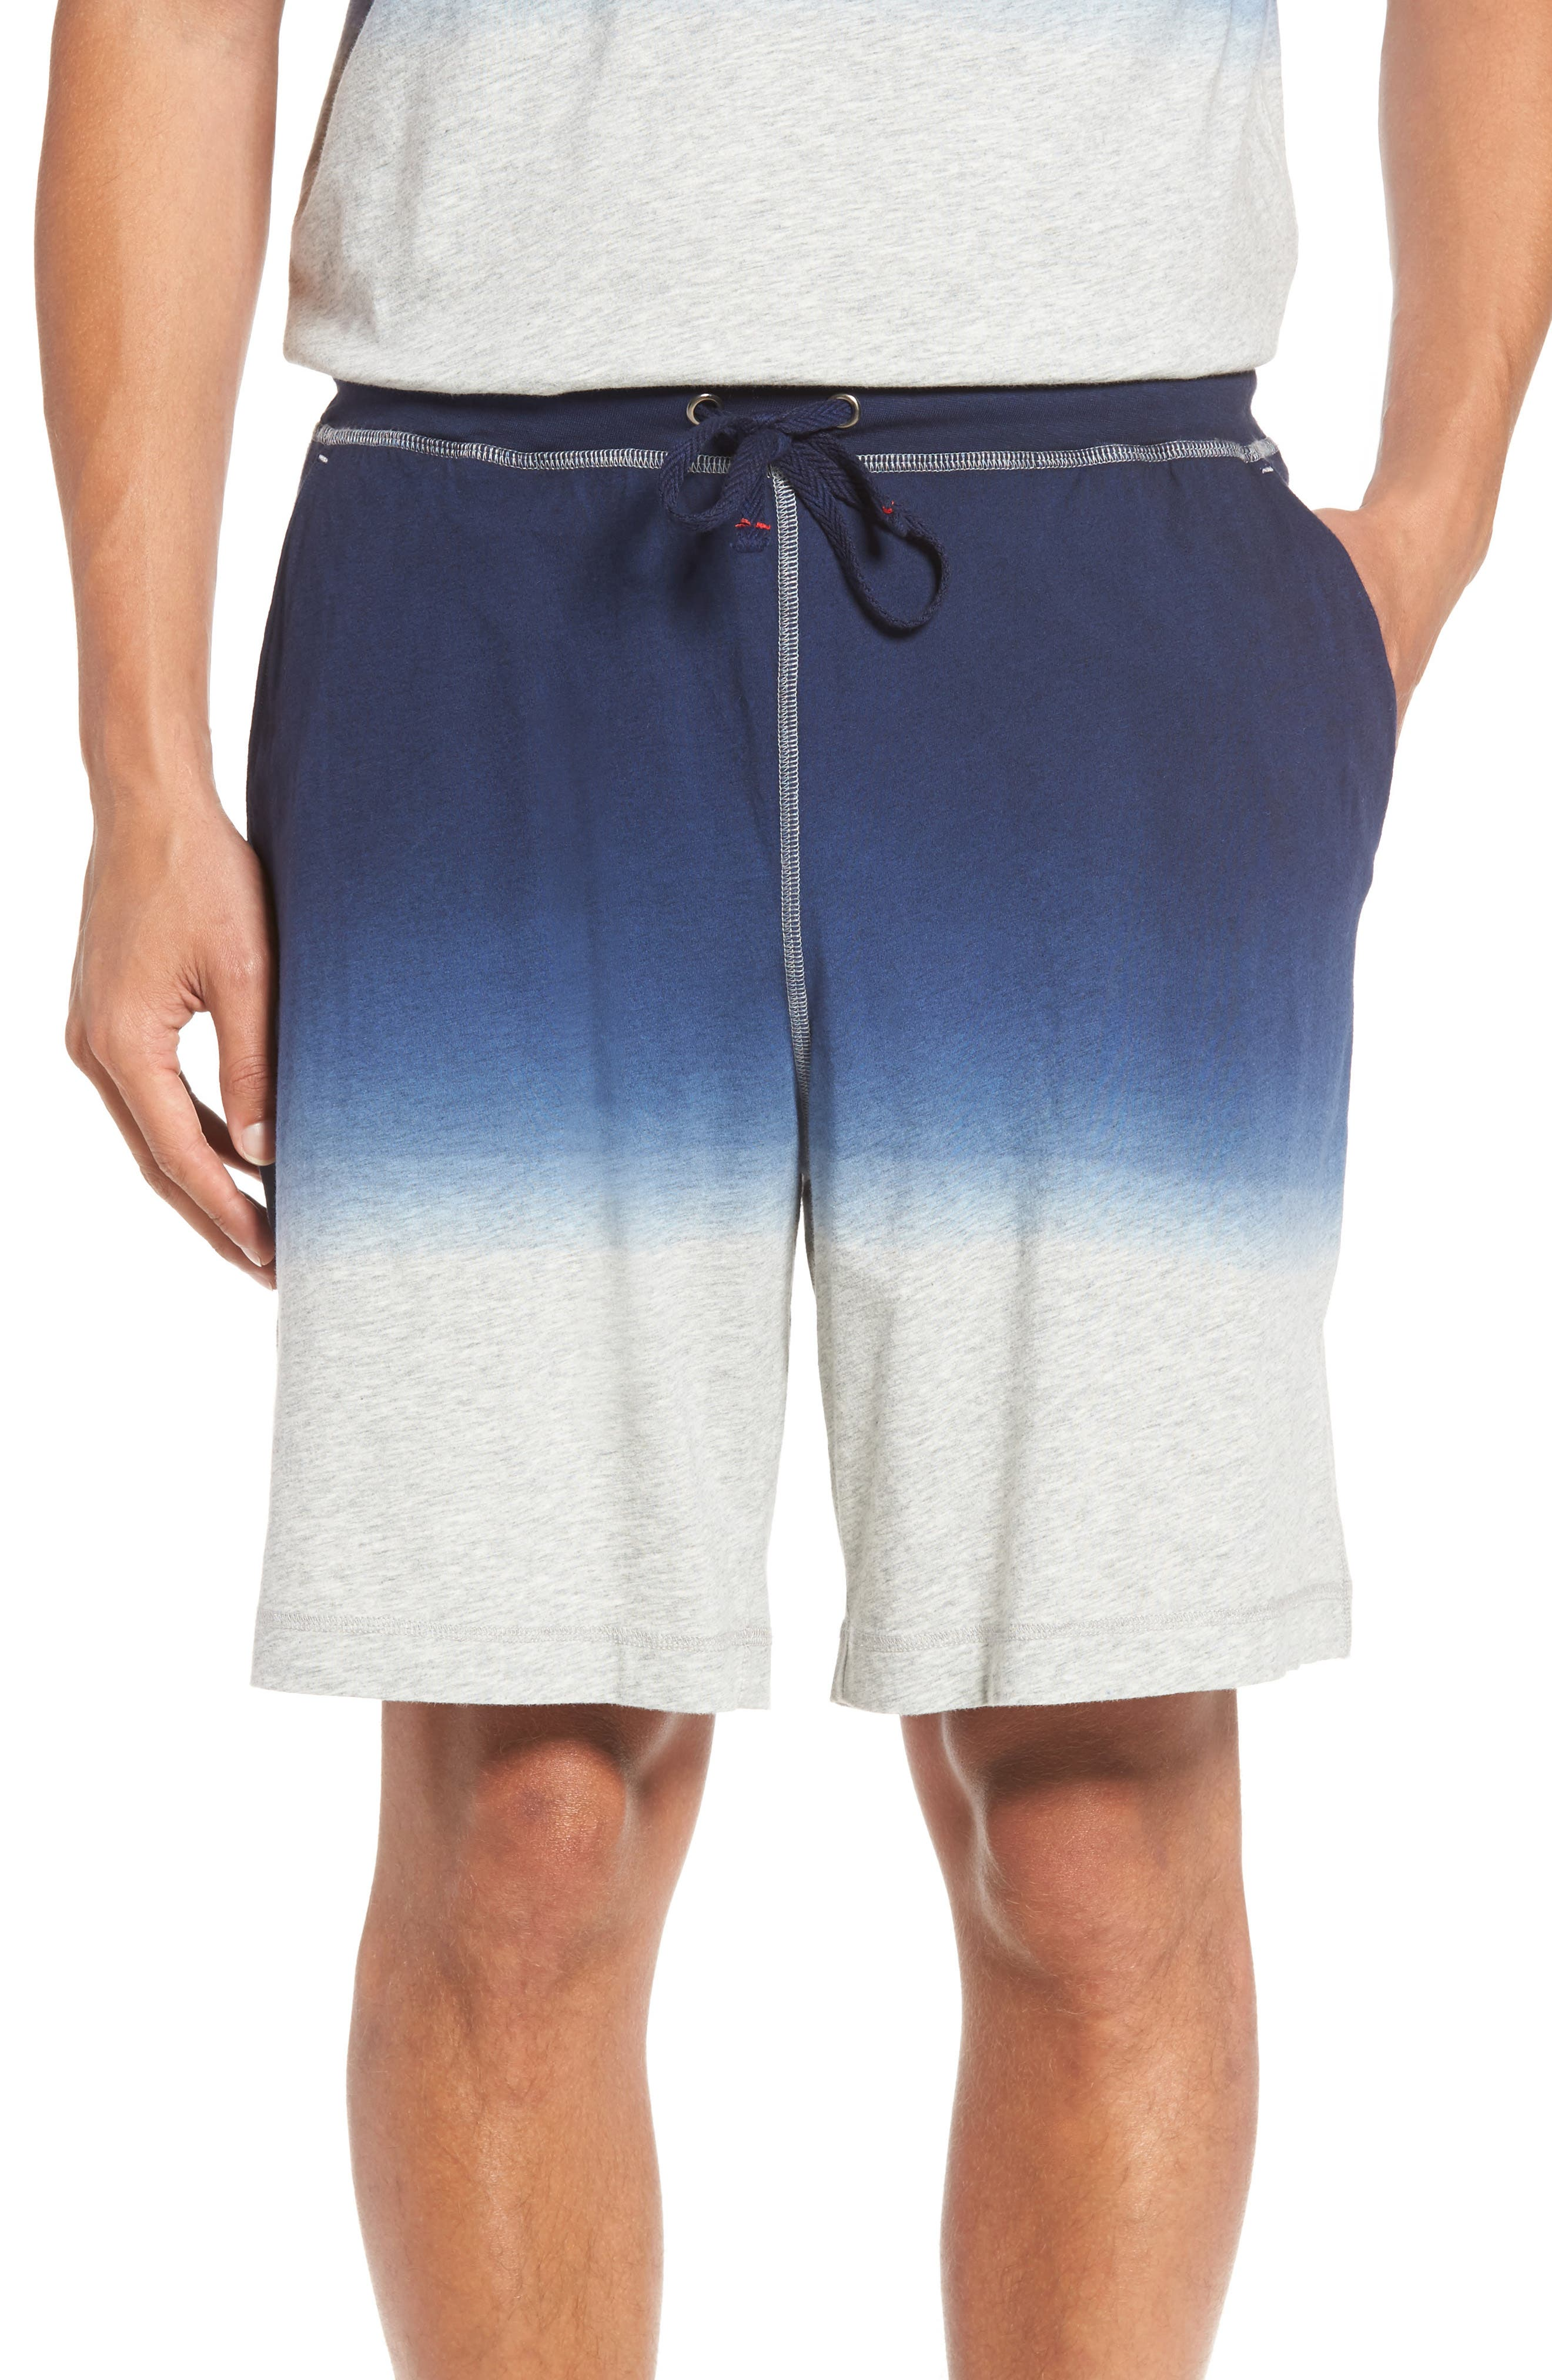 Dip Dye Lounge Shorts,                             Main thumbnail 1, color,                             Navy